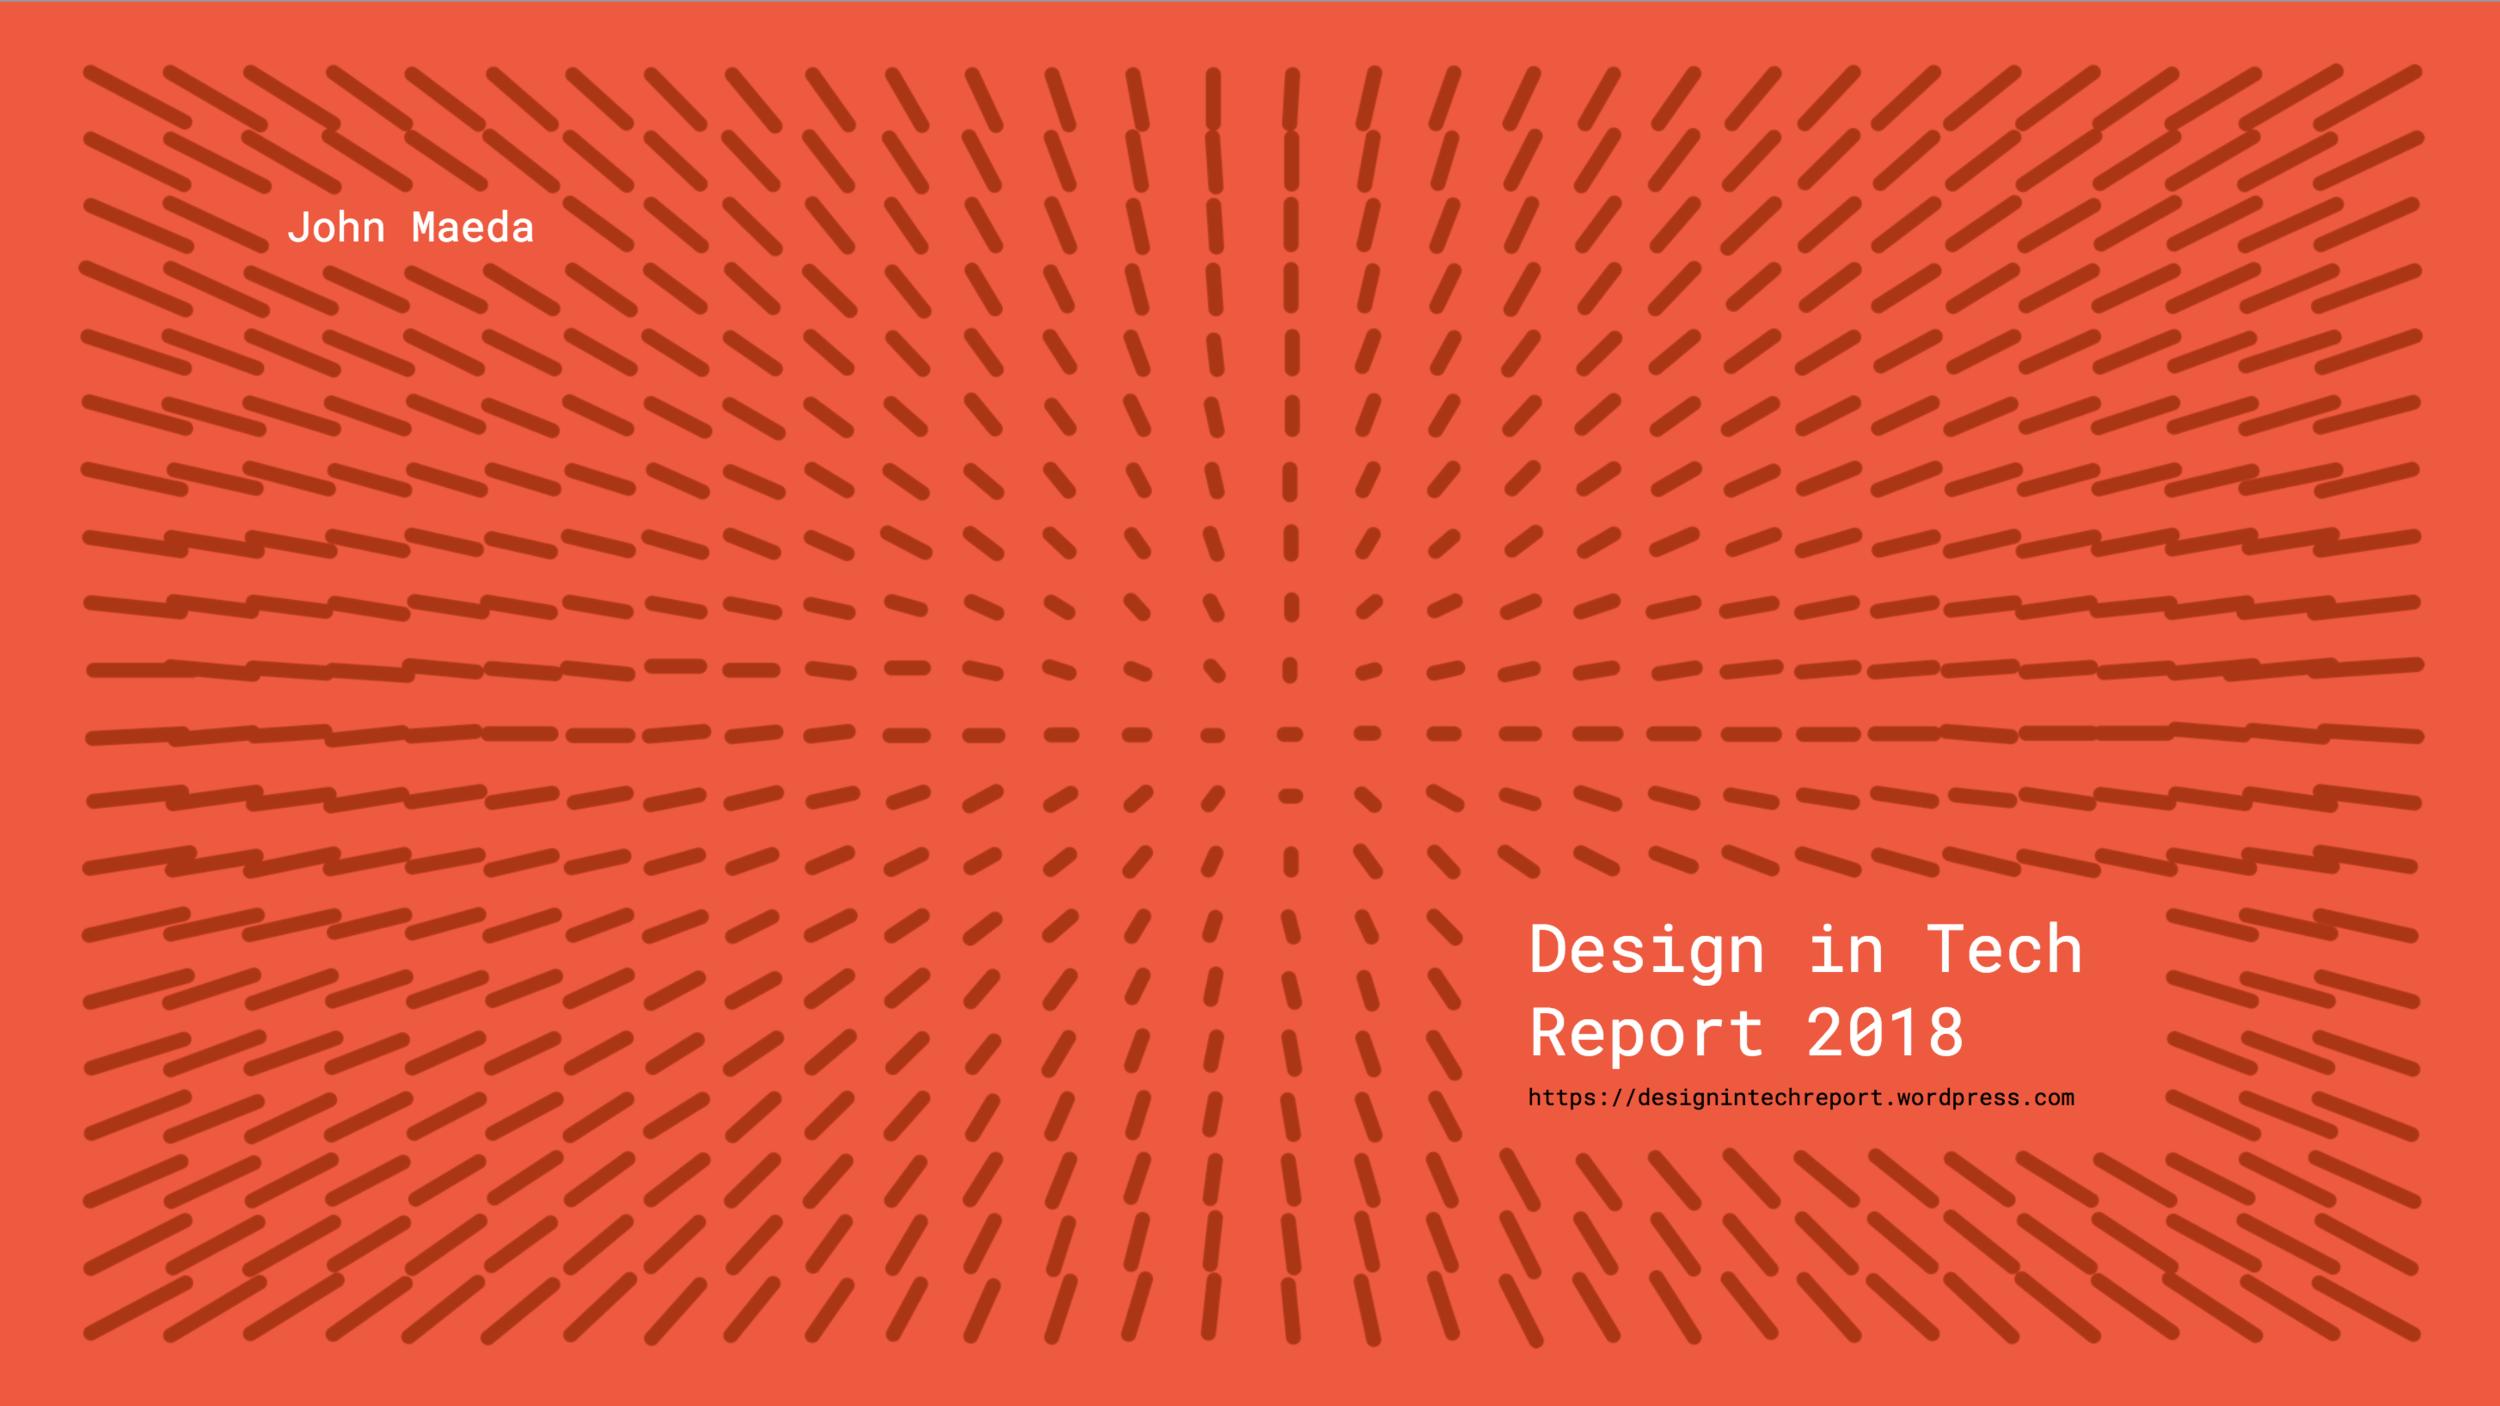 design-in-tech-2018.png